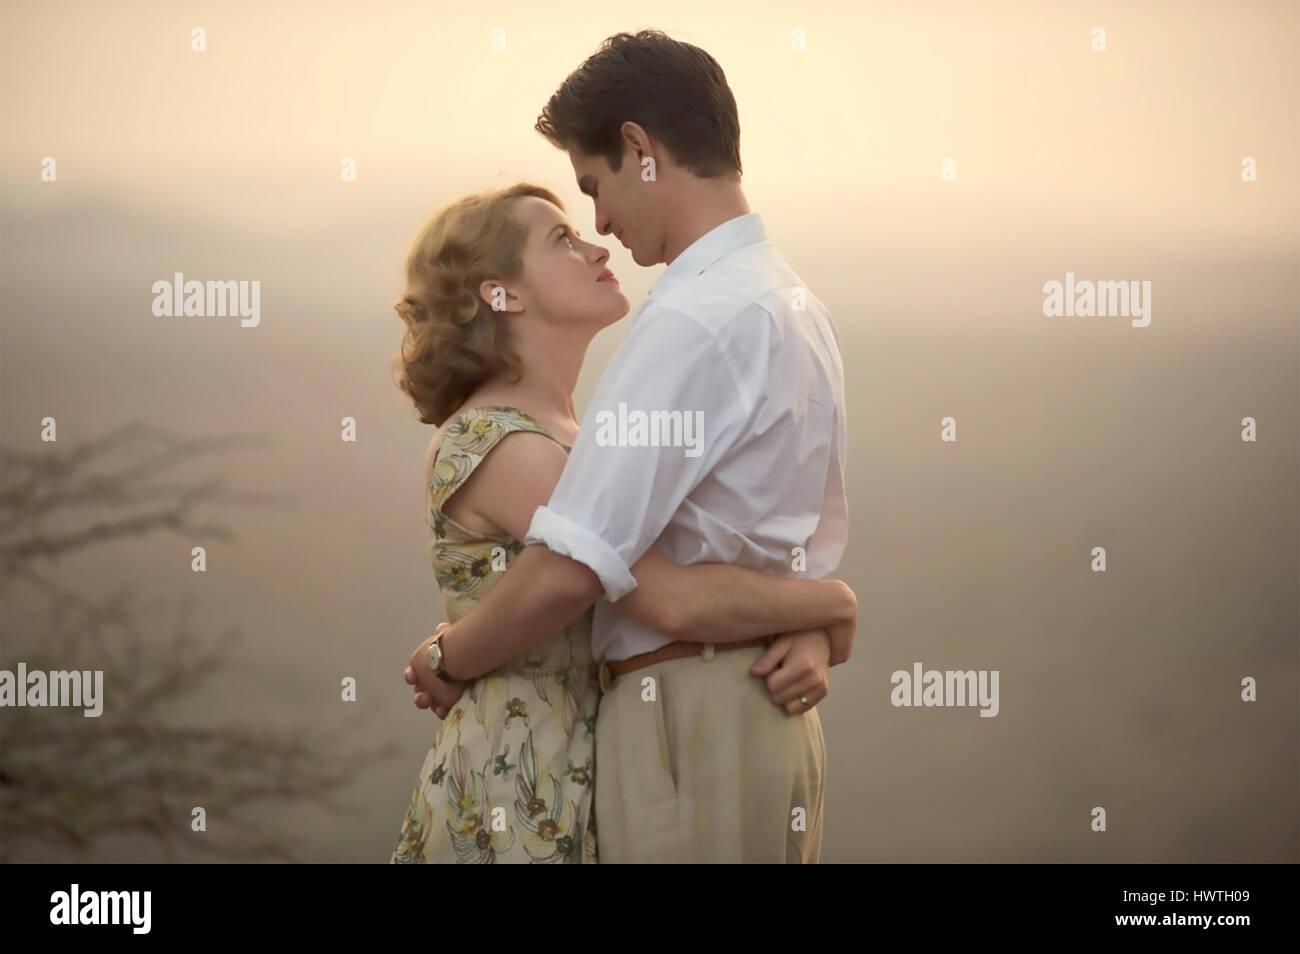 BREATHE 2017 Imaginarium Studios film with Claire Foy and Andrew Garfield - Stock Image